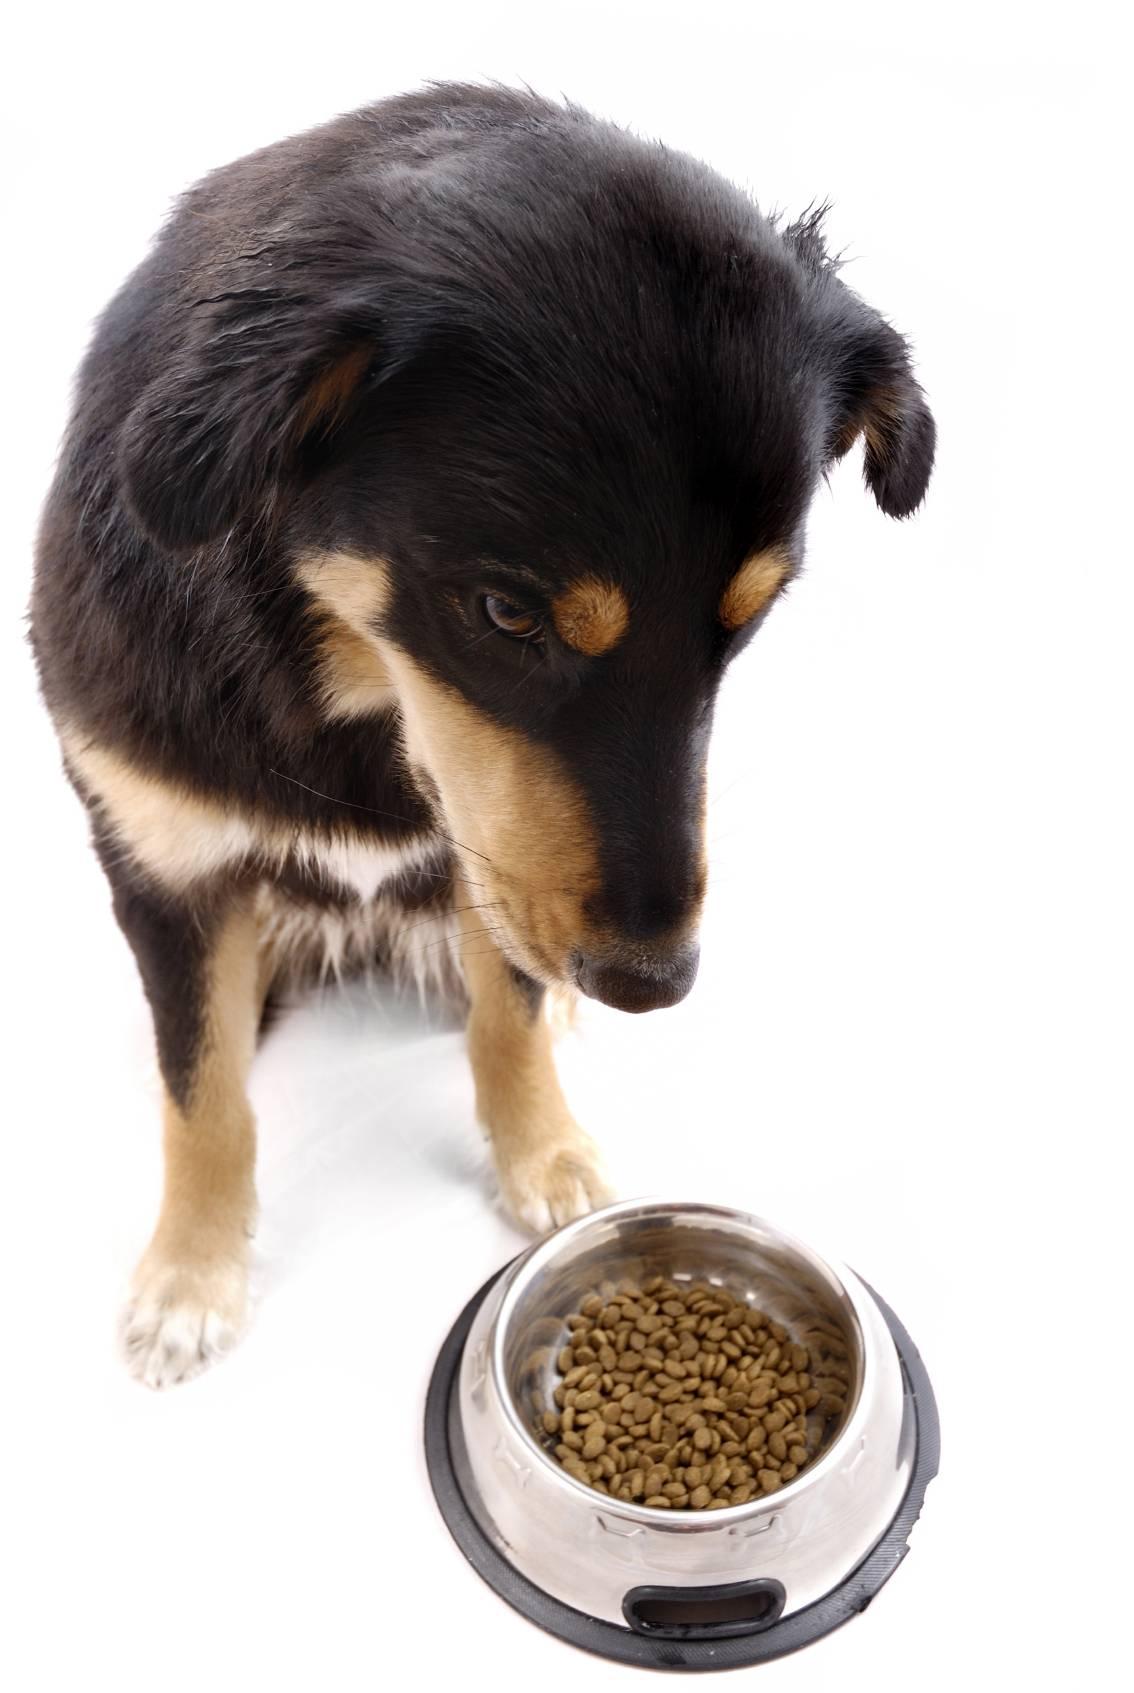 Почему собака не ест из миски, но ест с рук